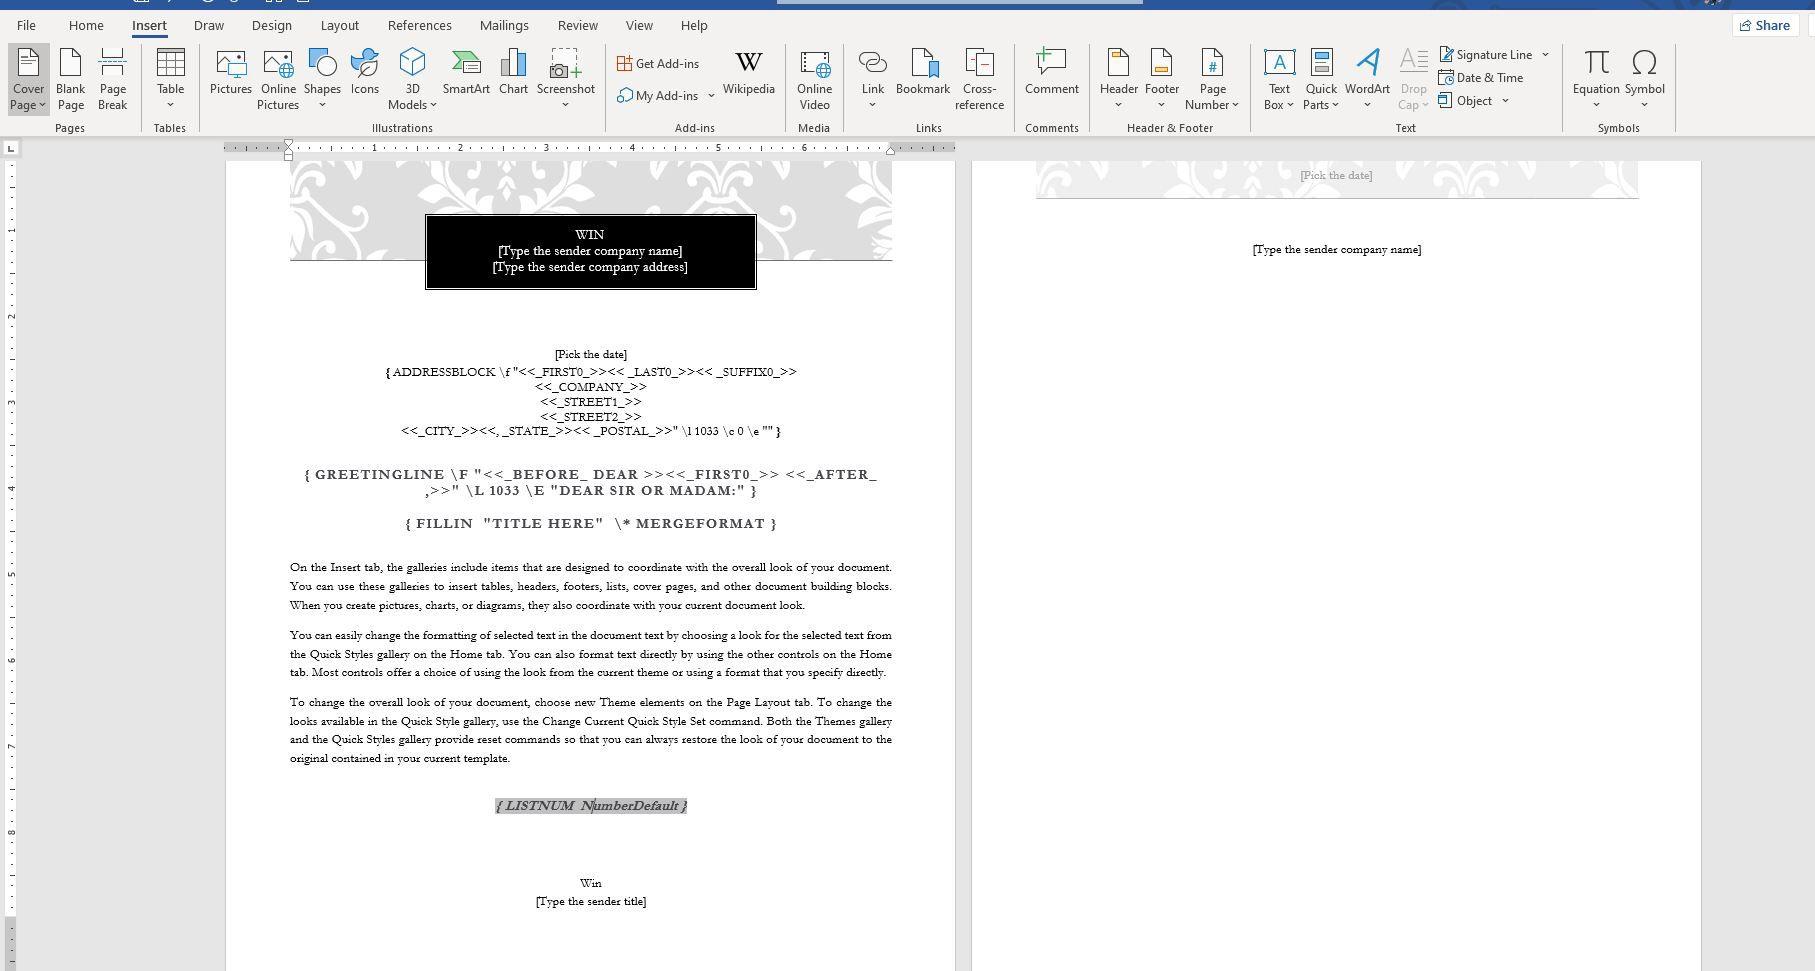 Screenshot of fields in mail merge document